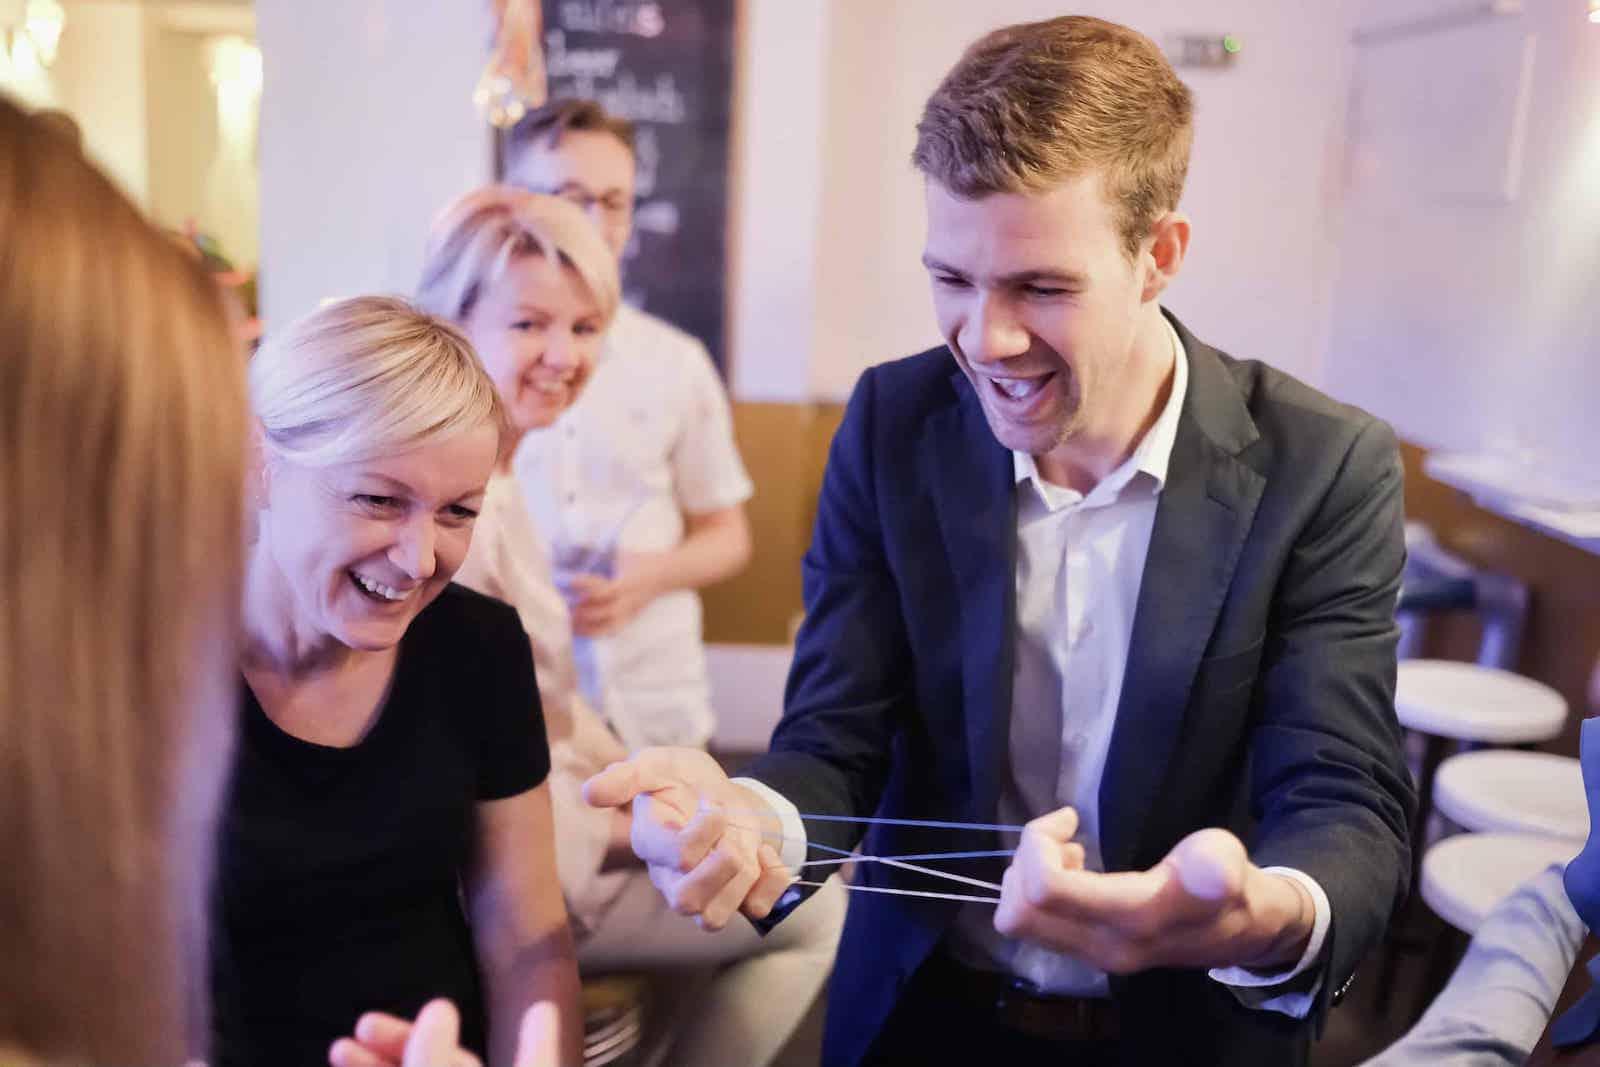 Zauberer Bornheim mit Publikum beim zaubern